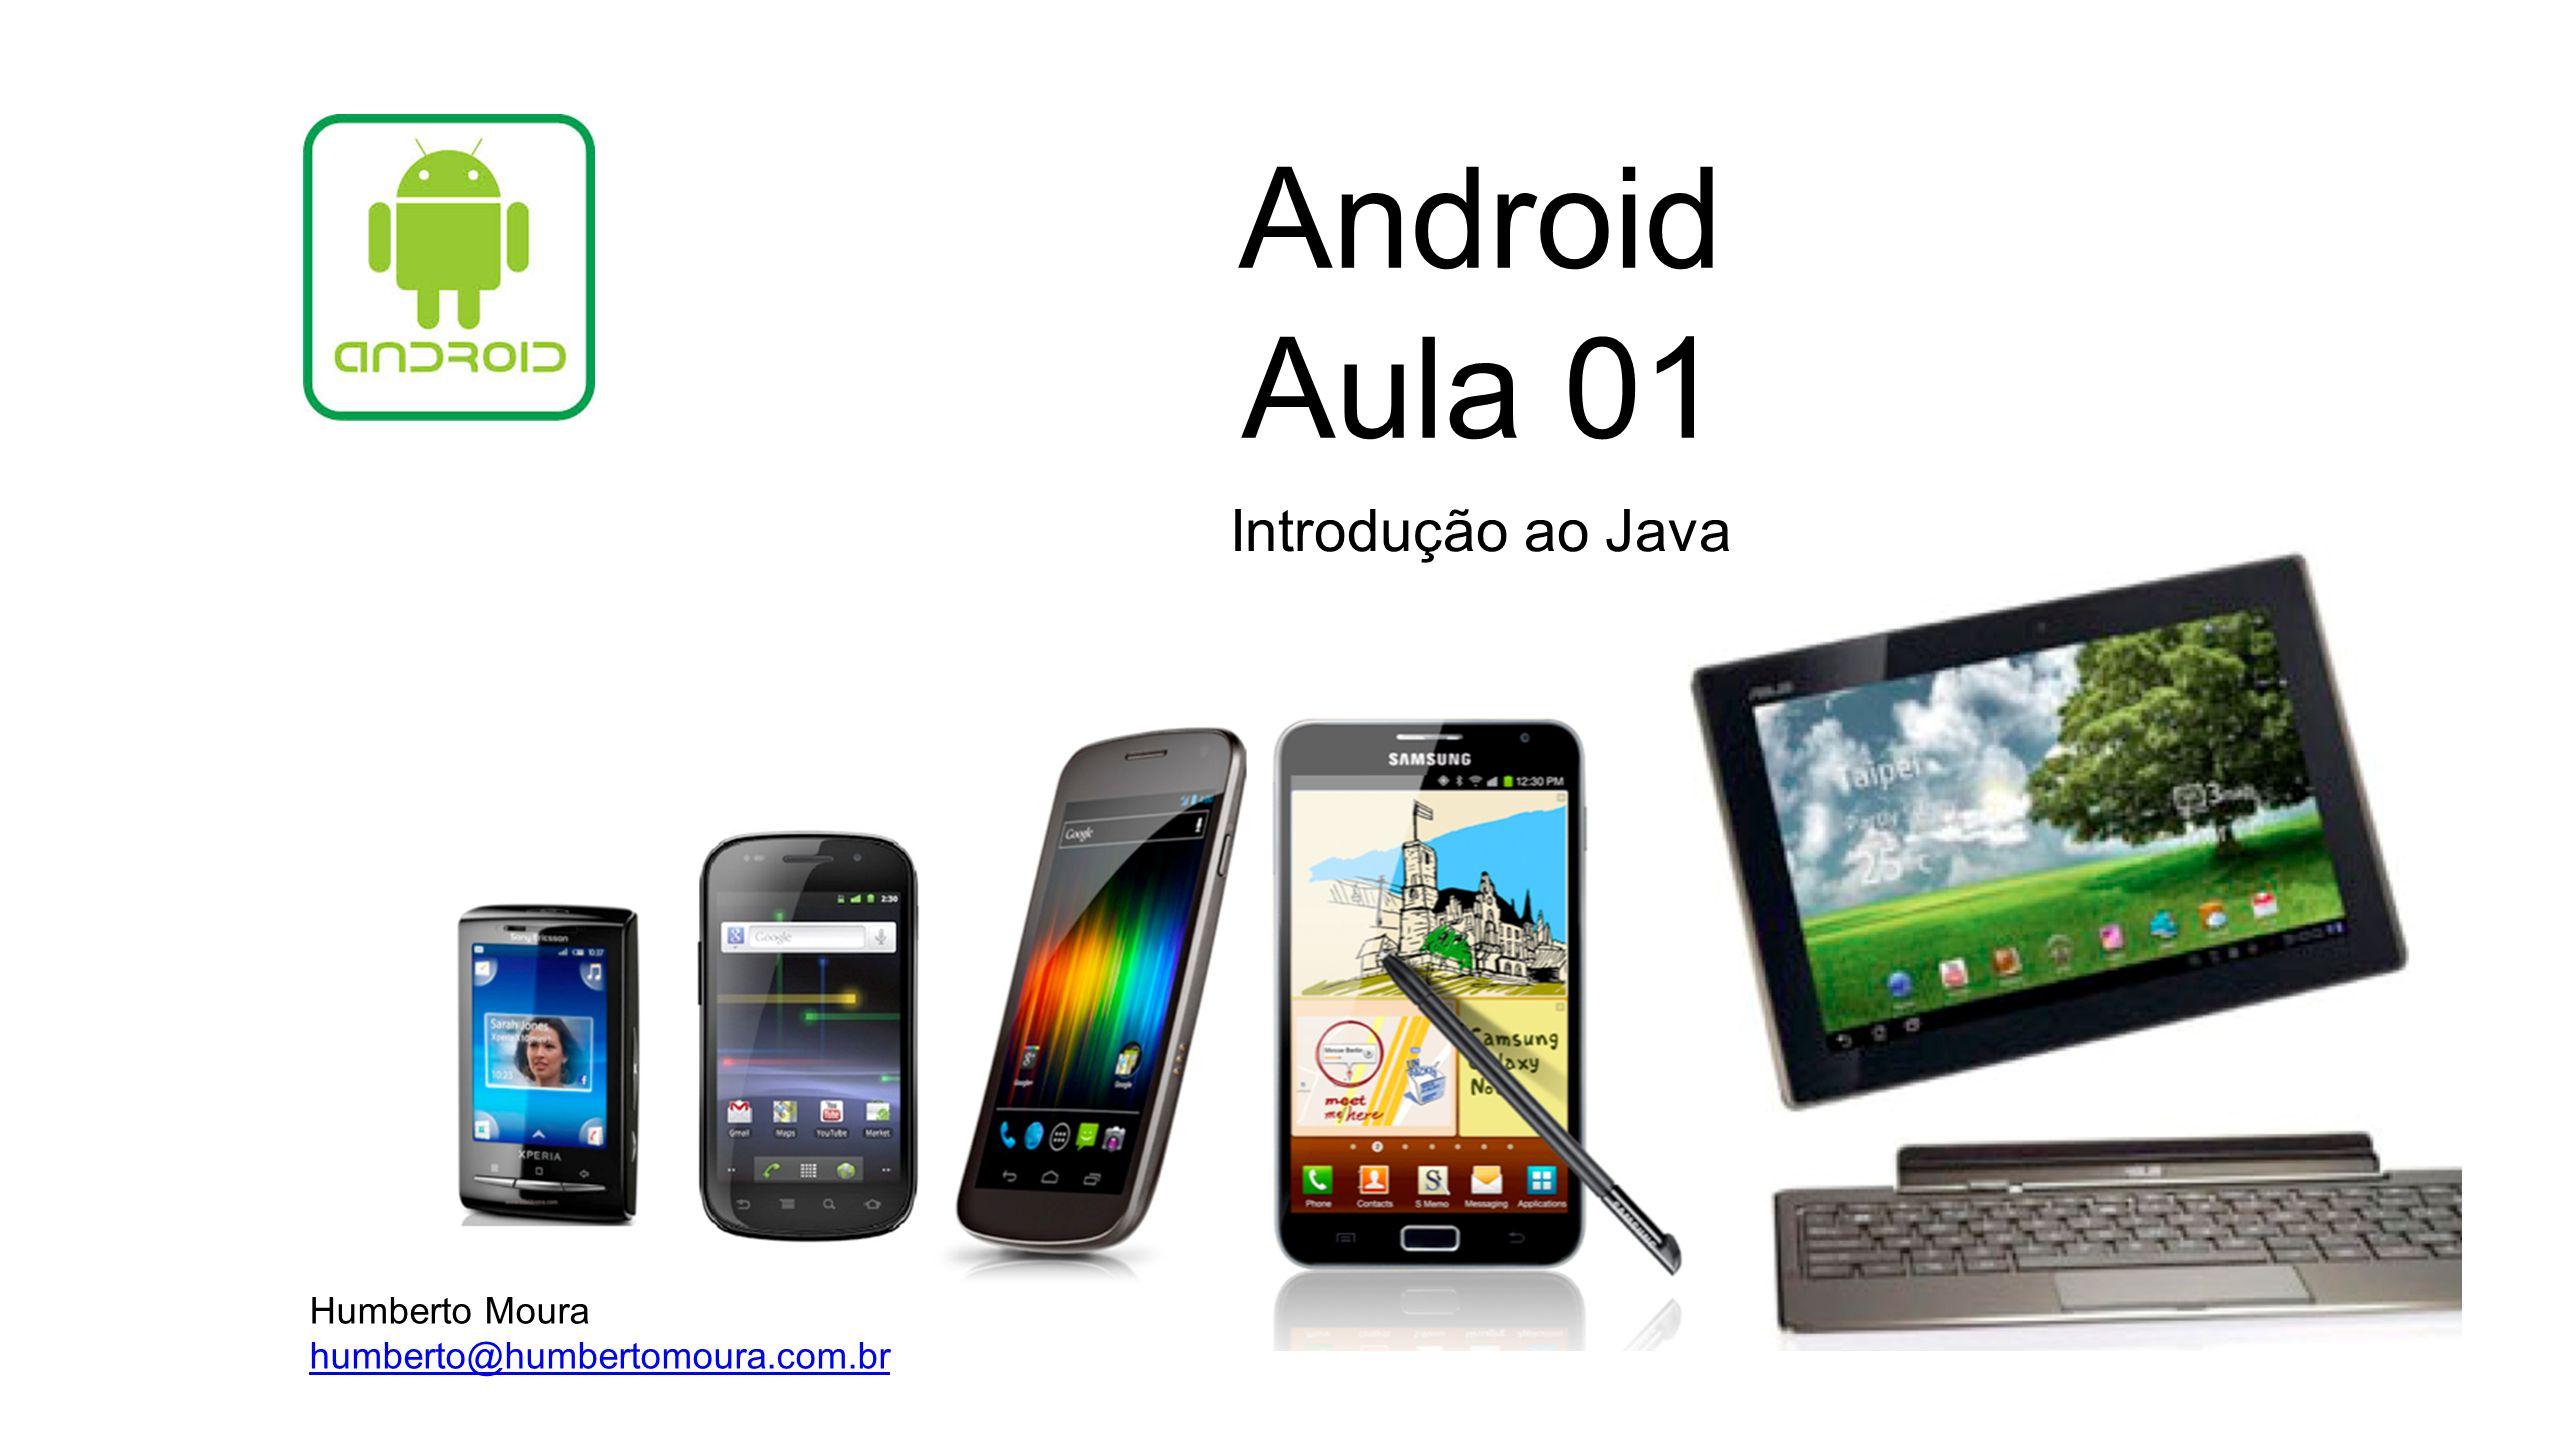 Android Aula 01 Introdução ao Java Humberto Moura humberto@humbertomoura.com.br